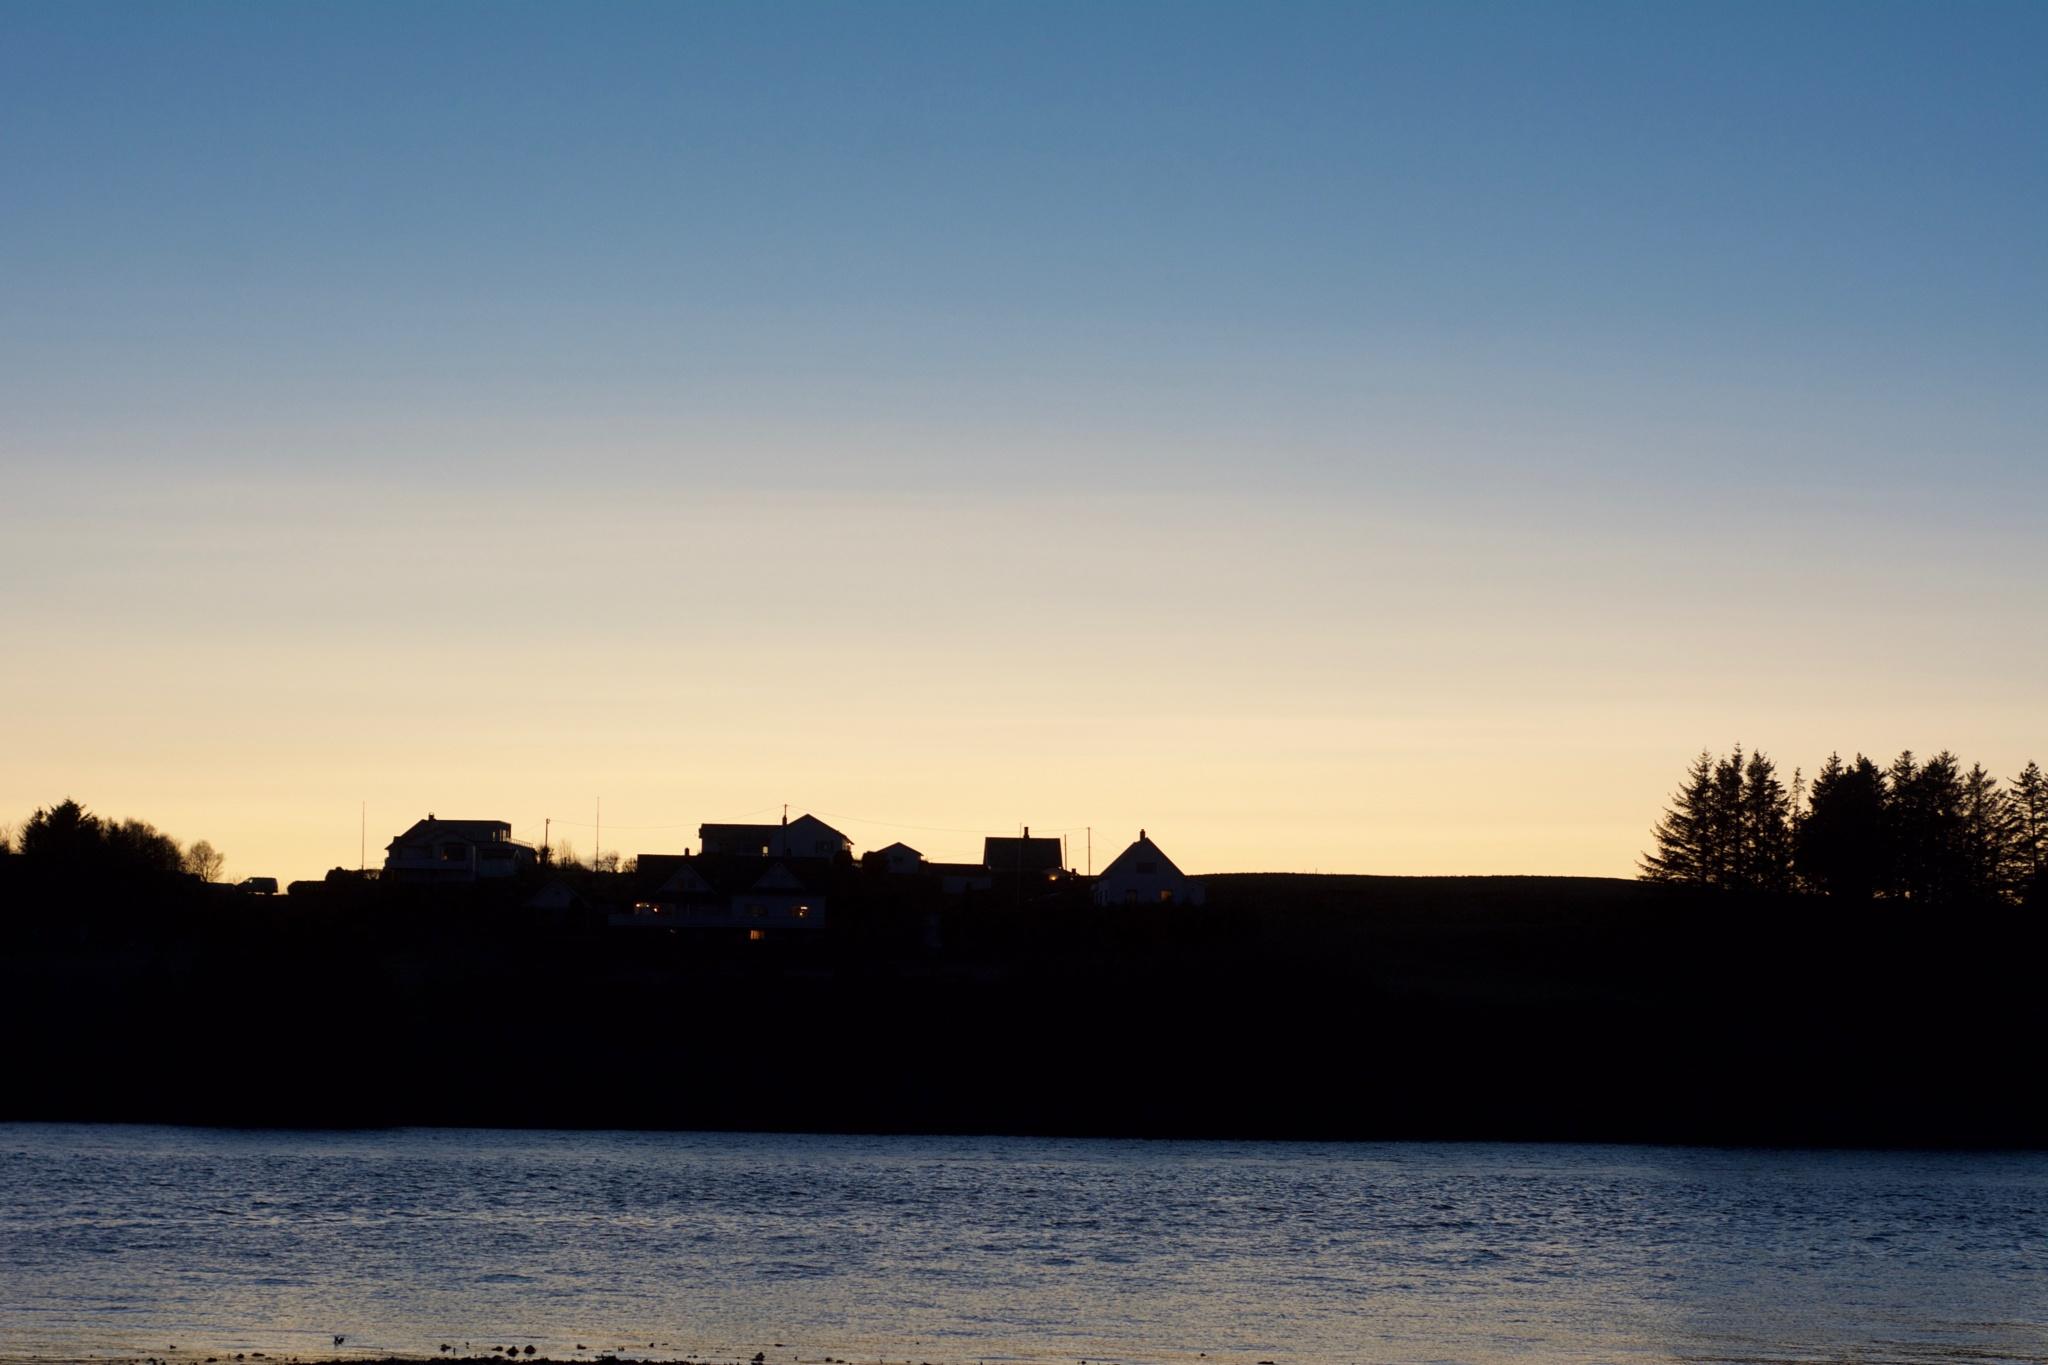 Sunset over Karmøy by Lars-Toralf Utnes Storstrand